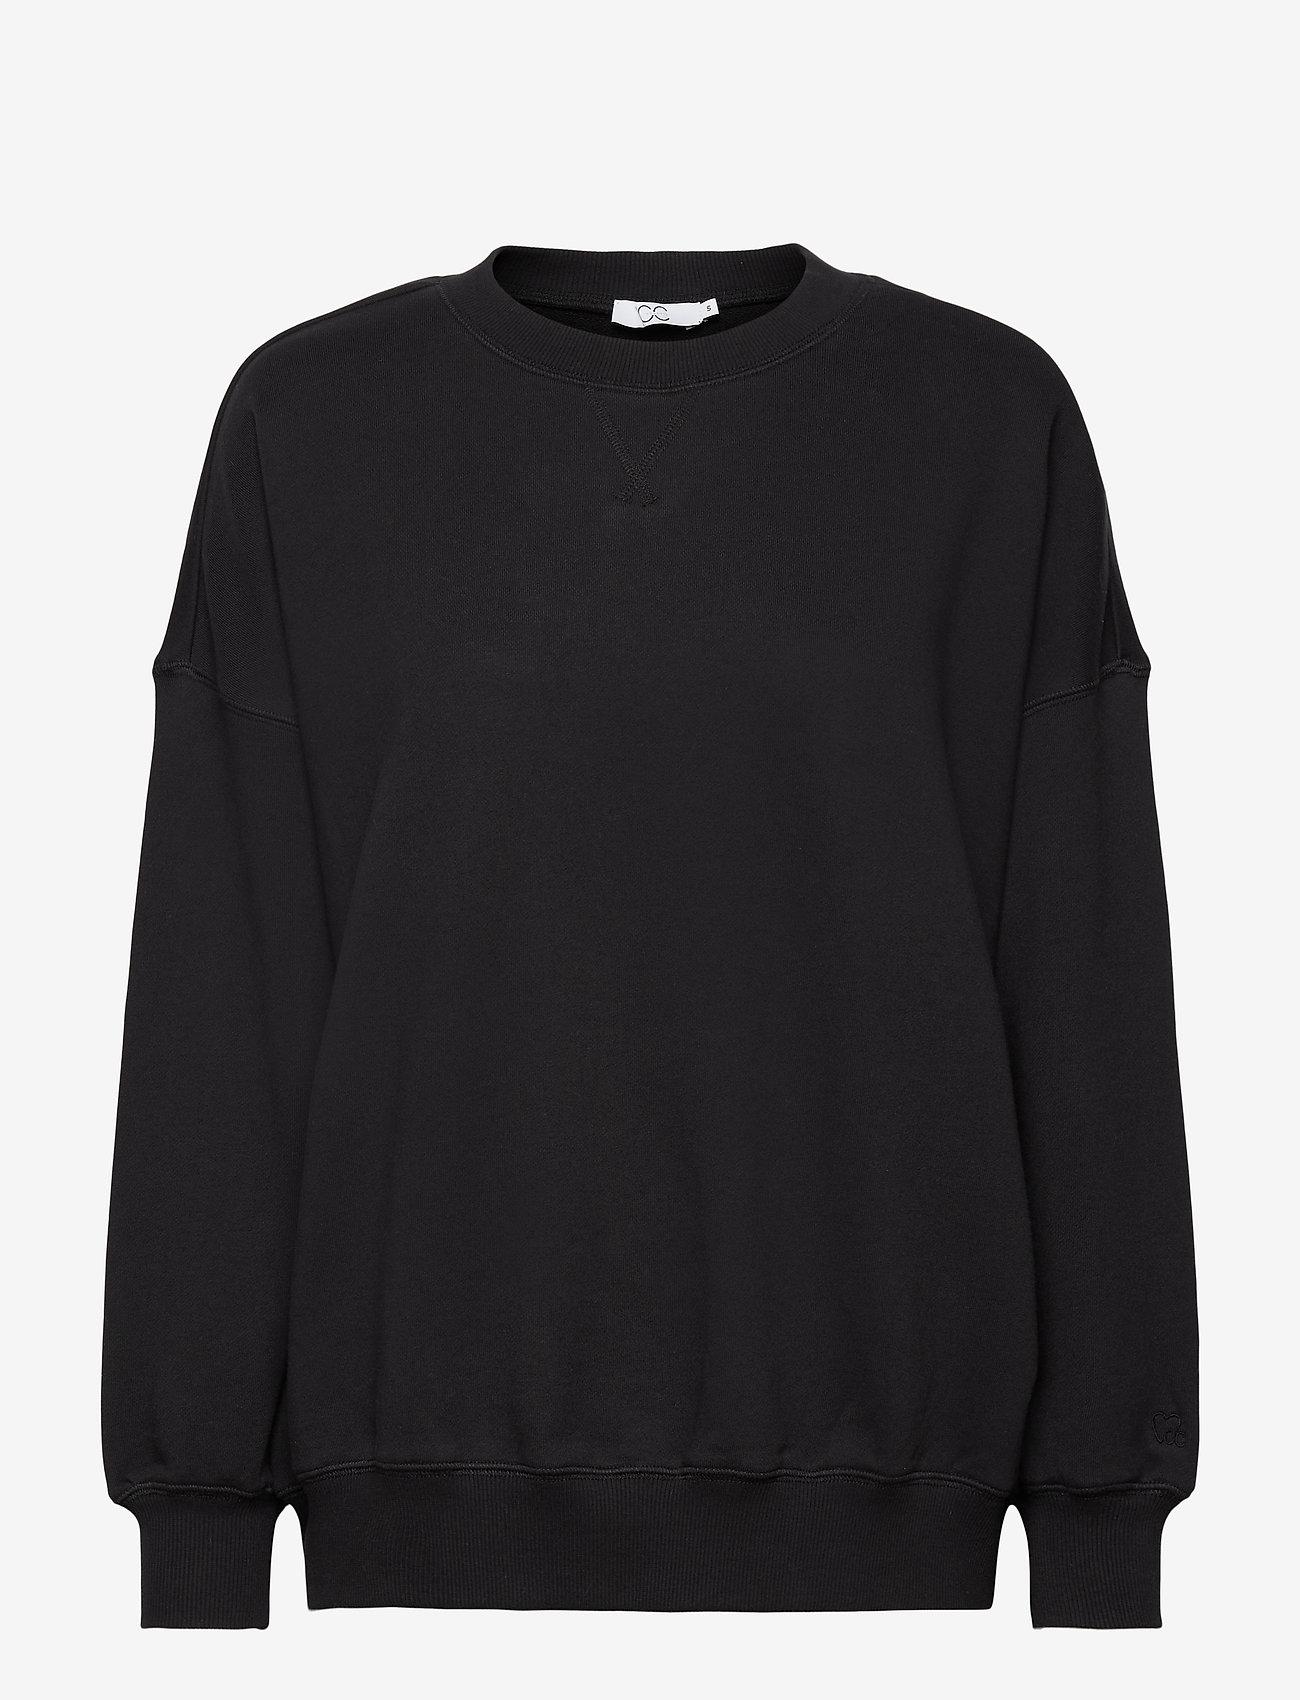 Coster Copenhagen - CC Heart oversize sweatshirt - Orga - sweatshirts & hættetrøjer - black - 0